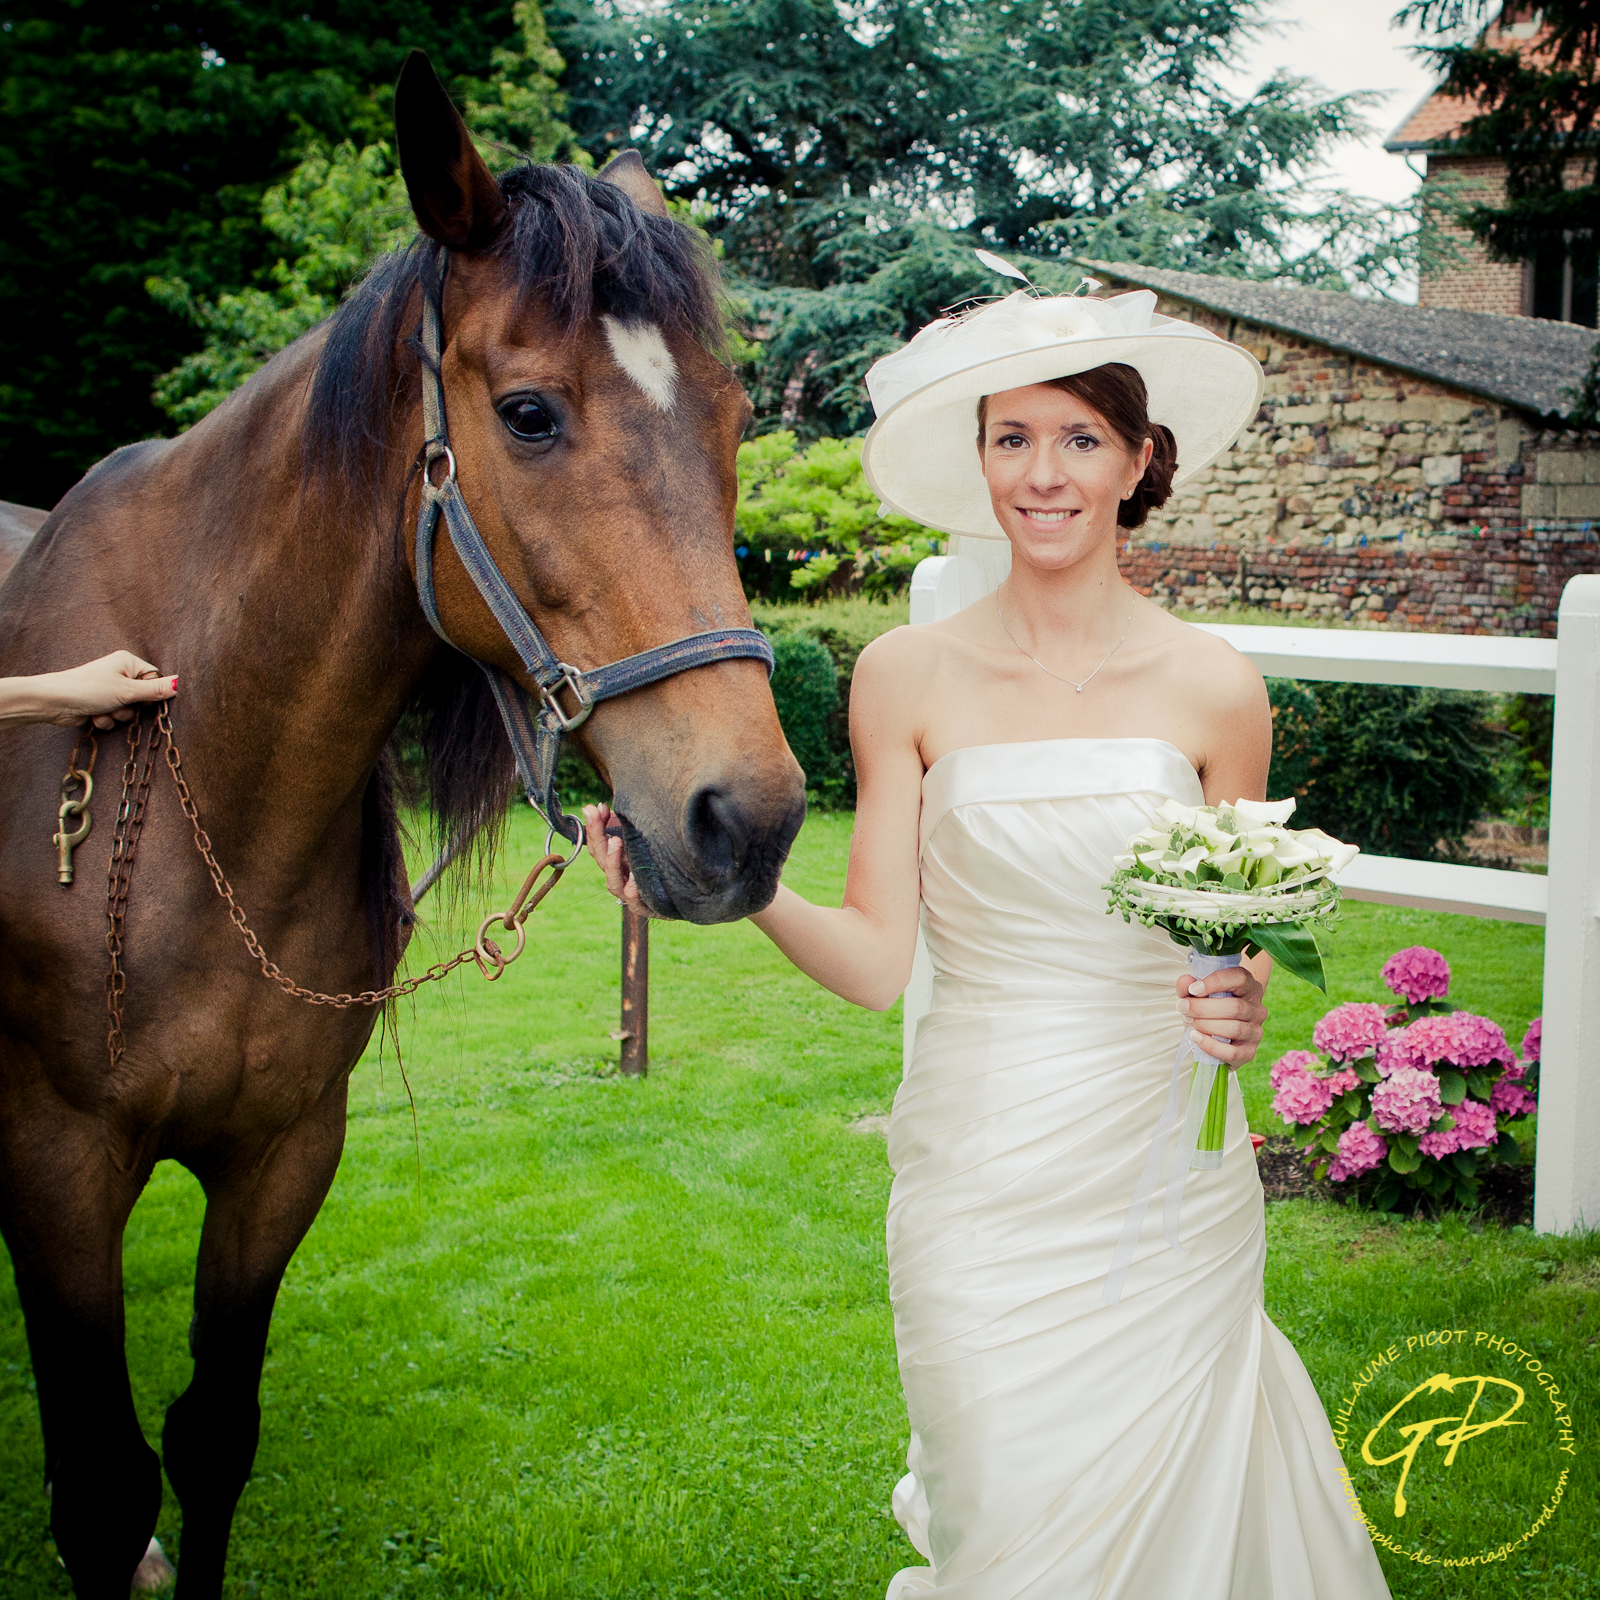 photographe mariage nord (34 sur 96)